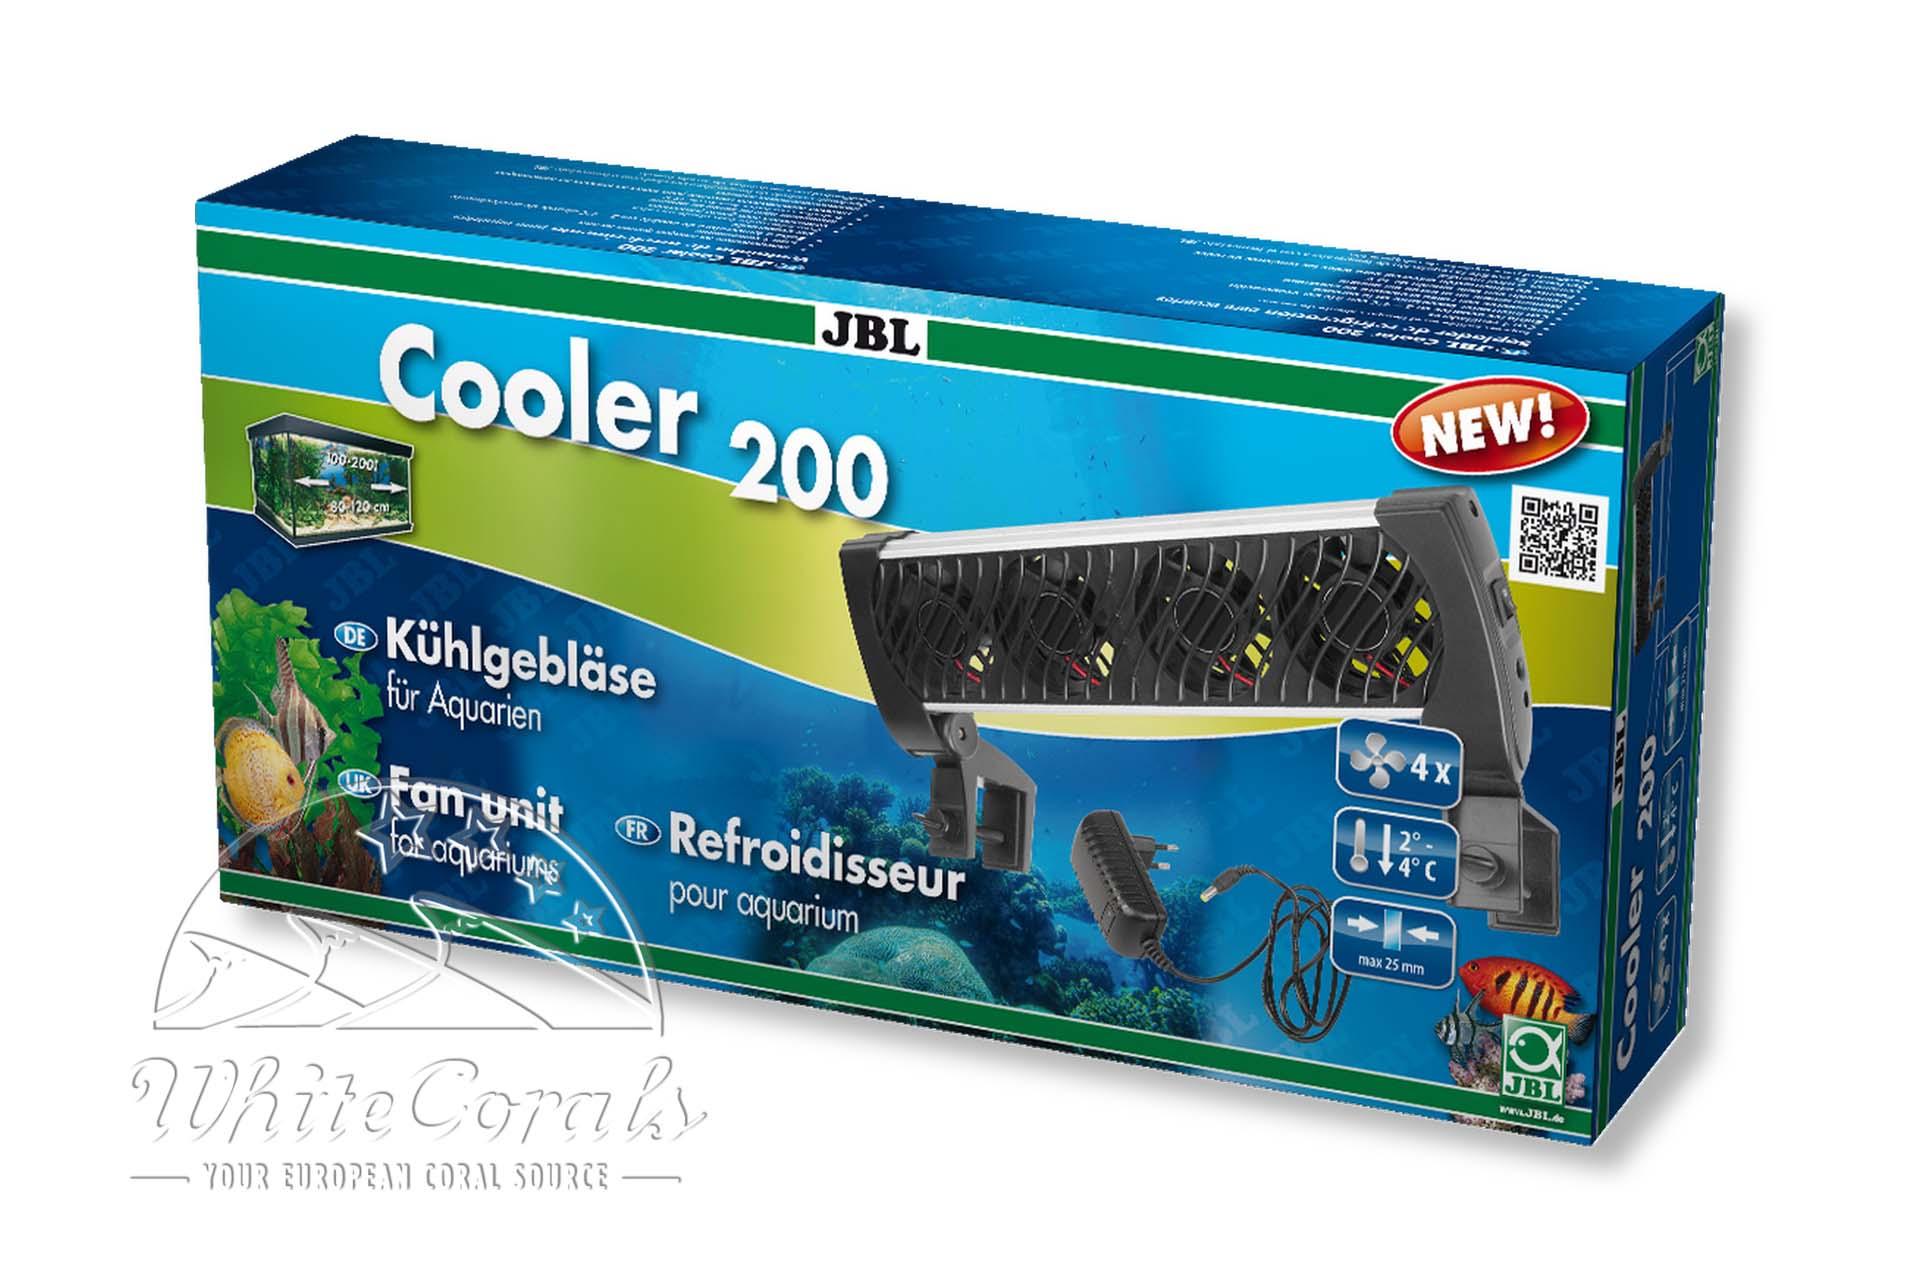 JBL Cooler 200 +